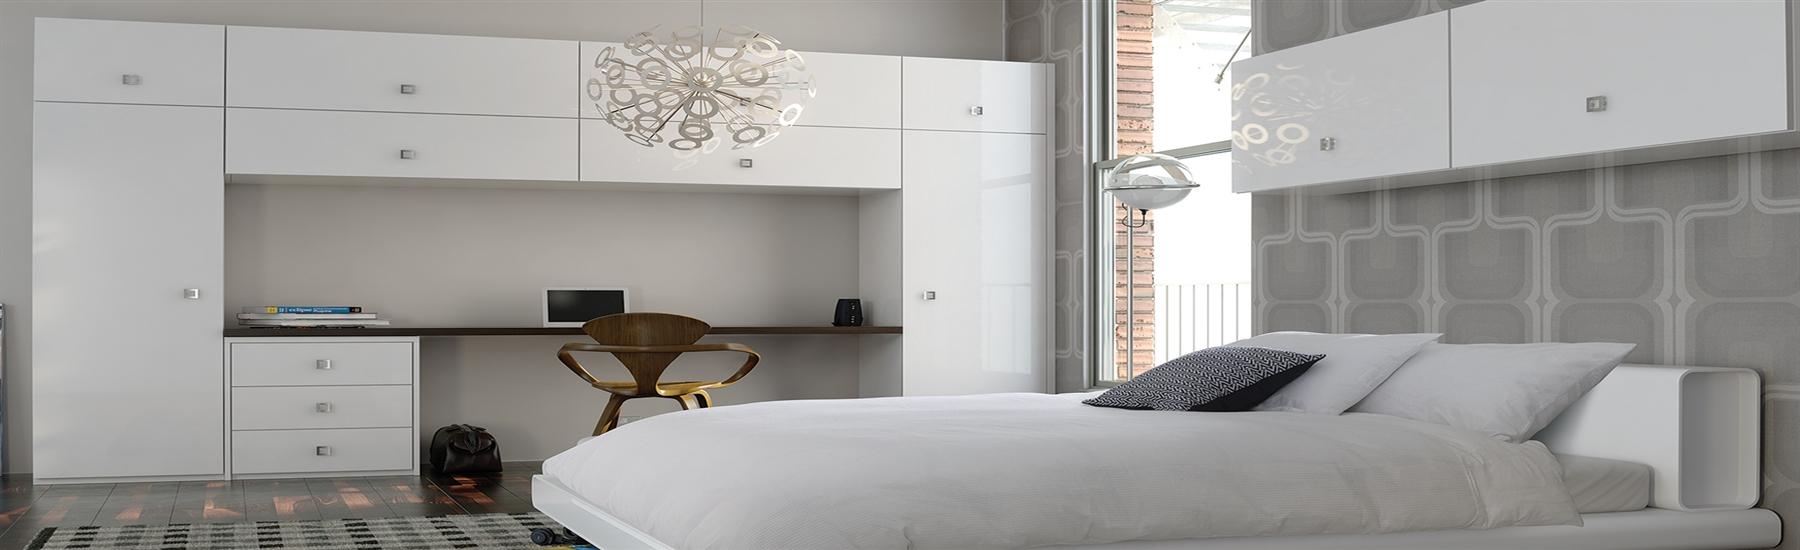 bedroom-header2